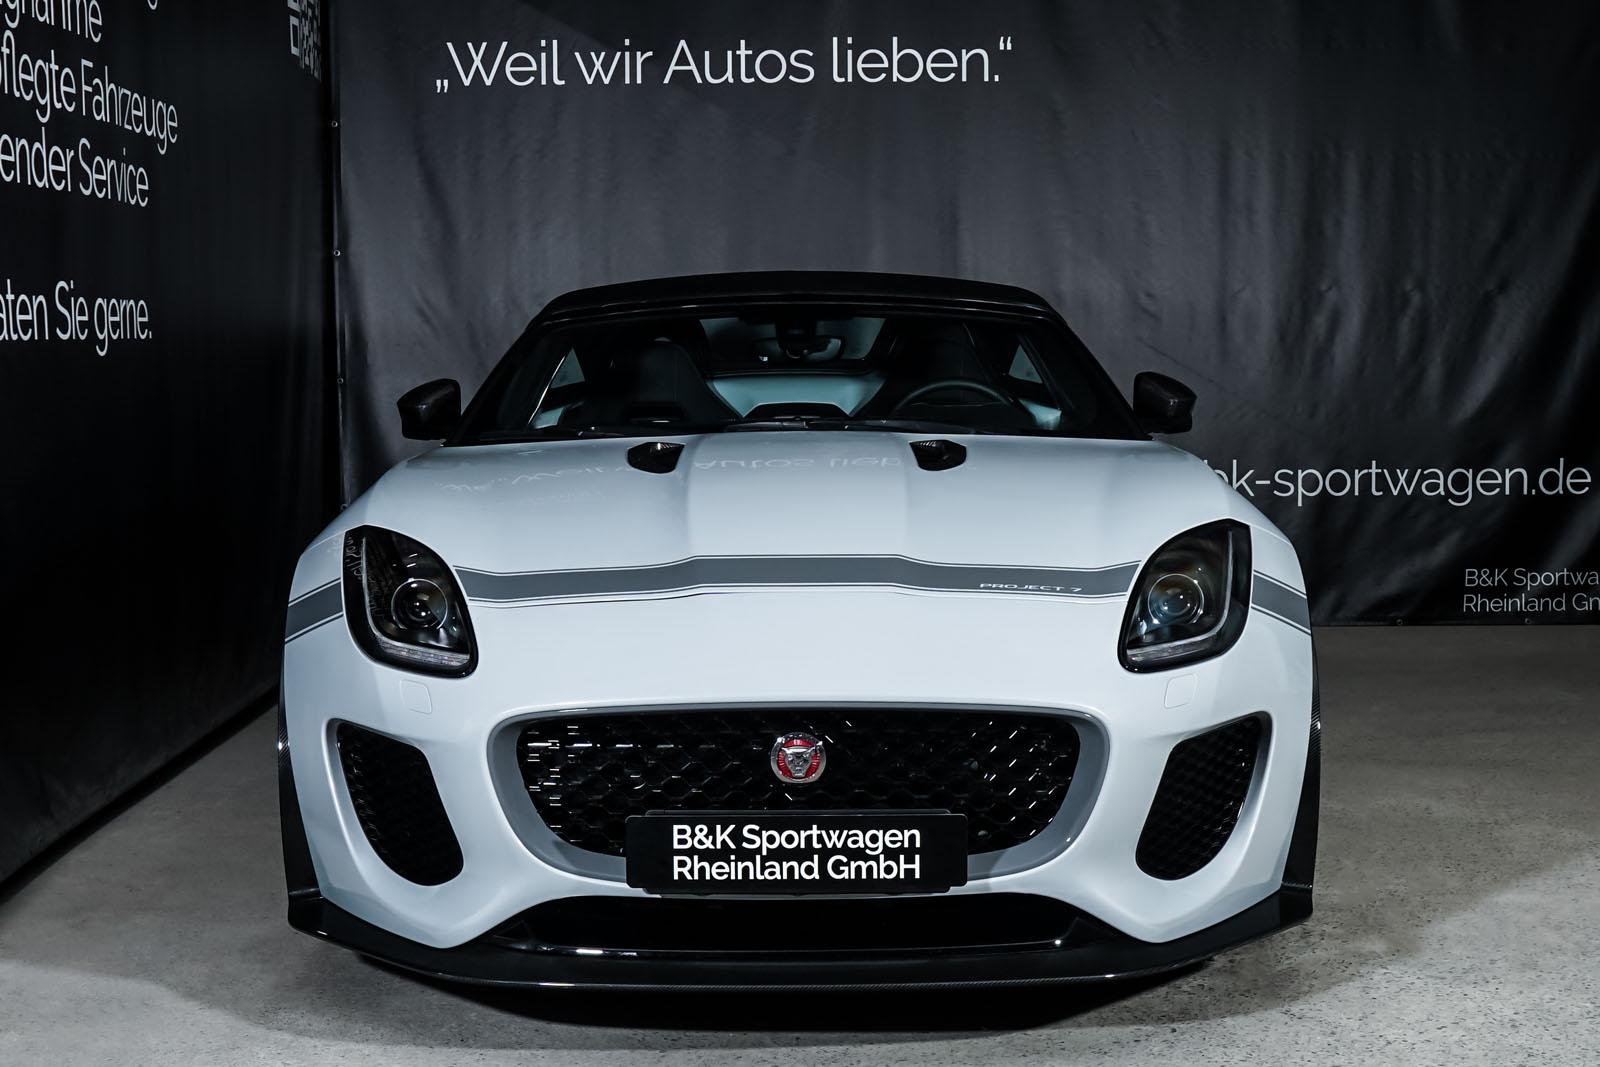 Jaguar_Project7_Weiss_Schwarz_JAG-0829_1_w